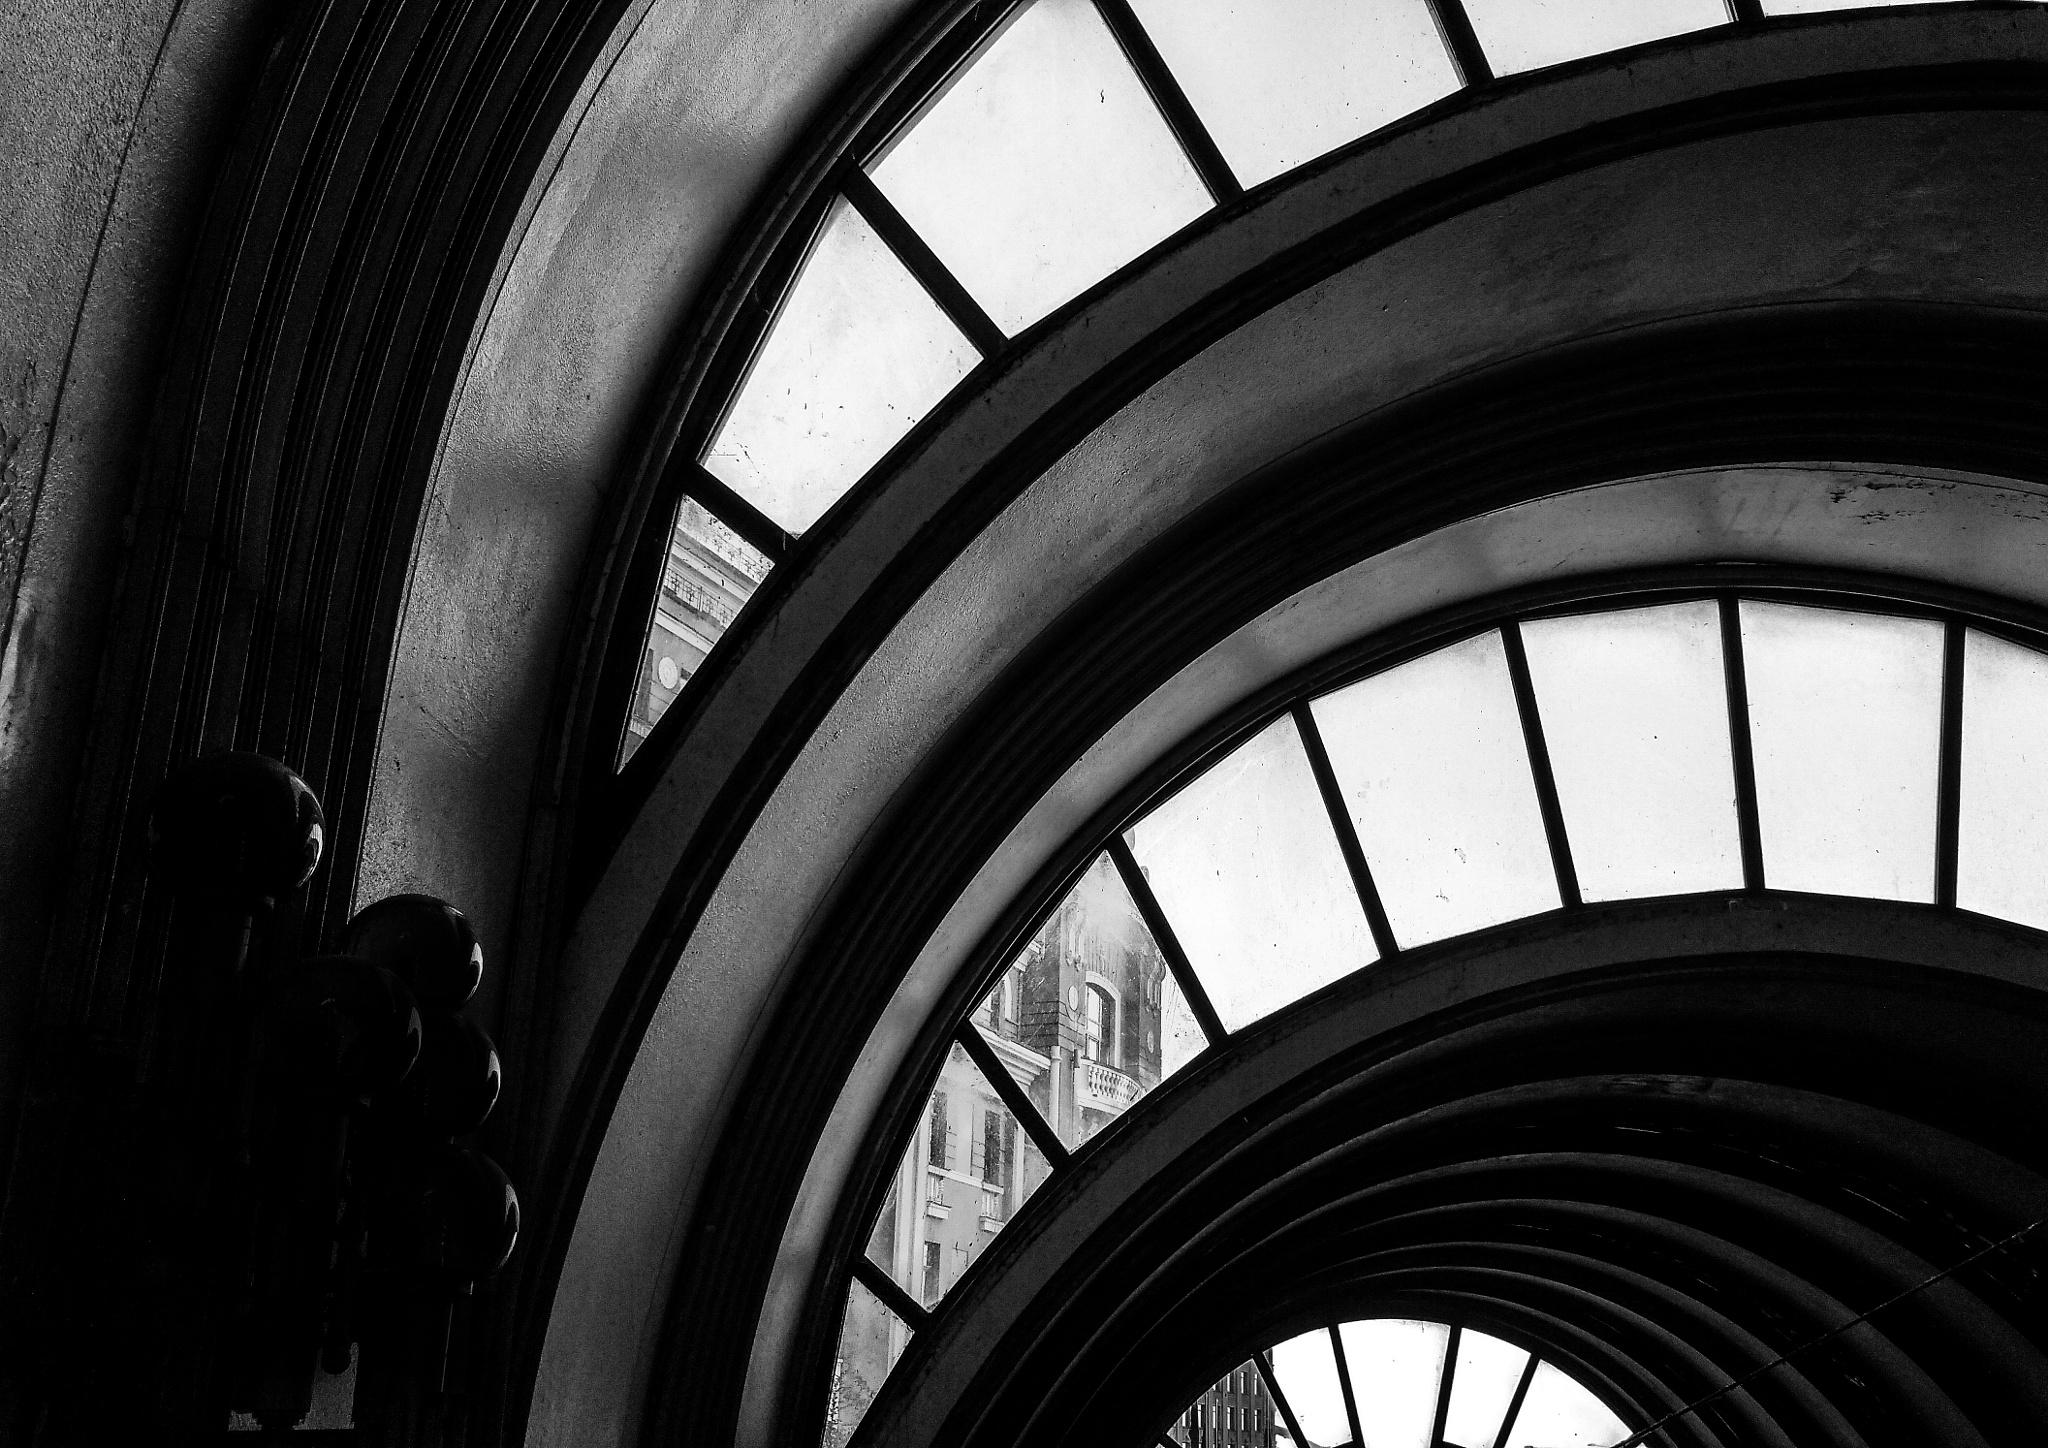 kiev Funicular by ctsit